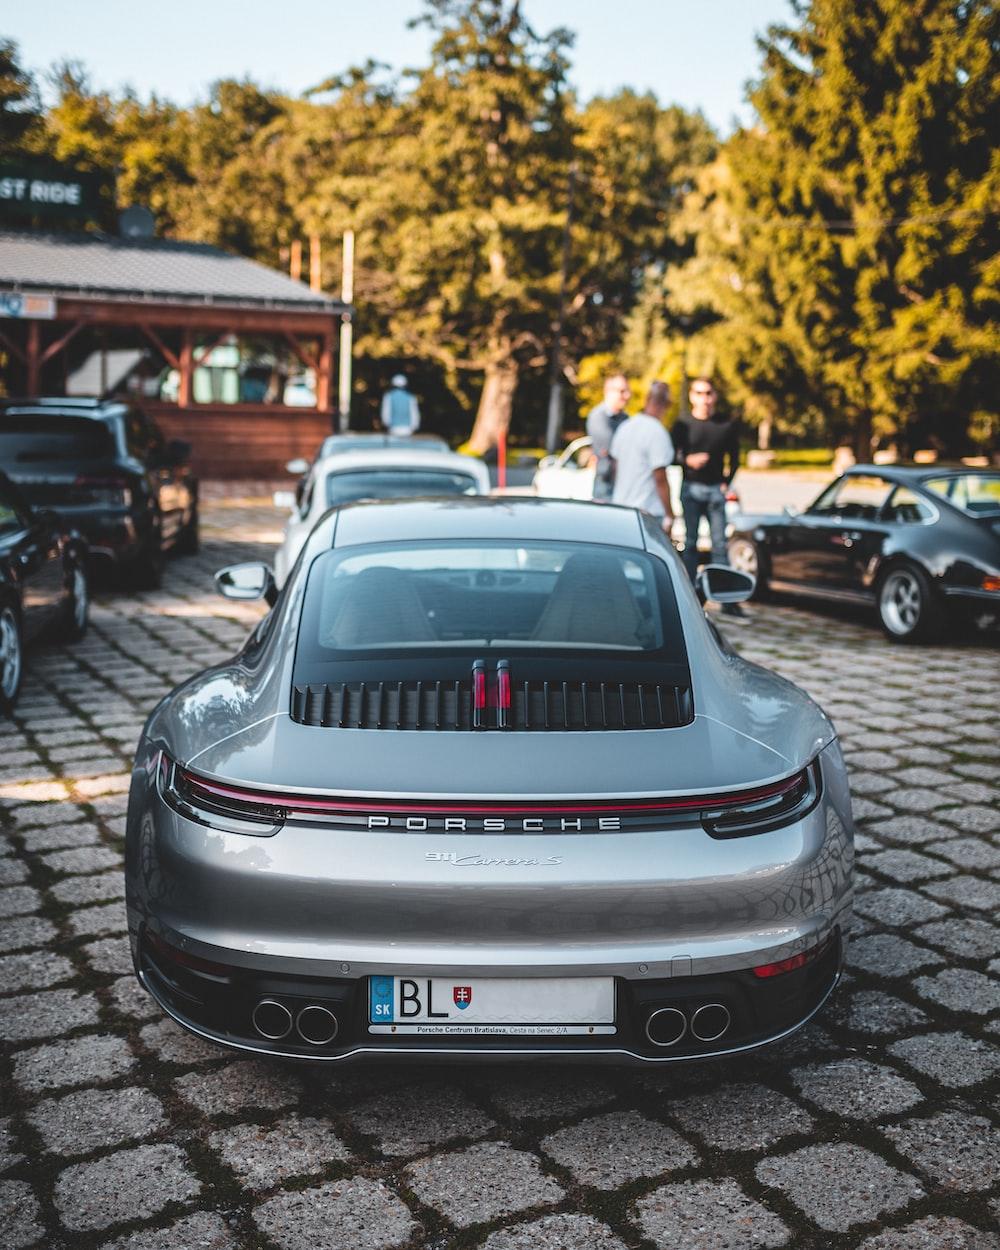 silver Porsche car parked near green trees